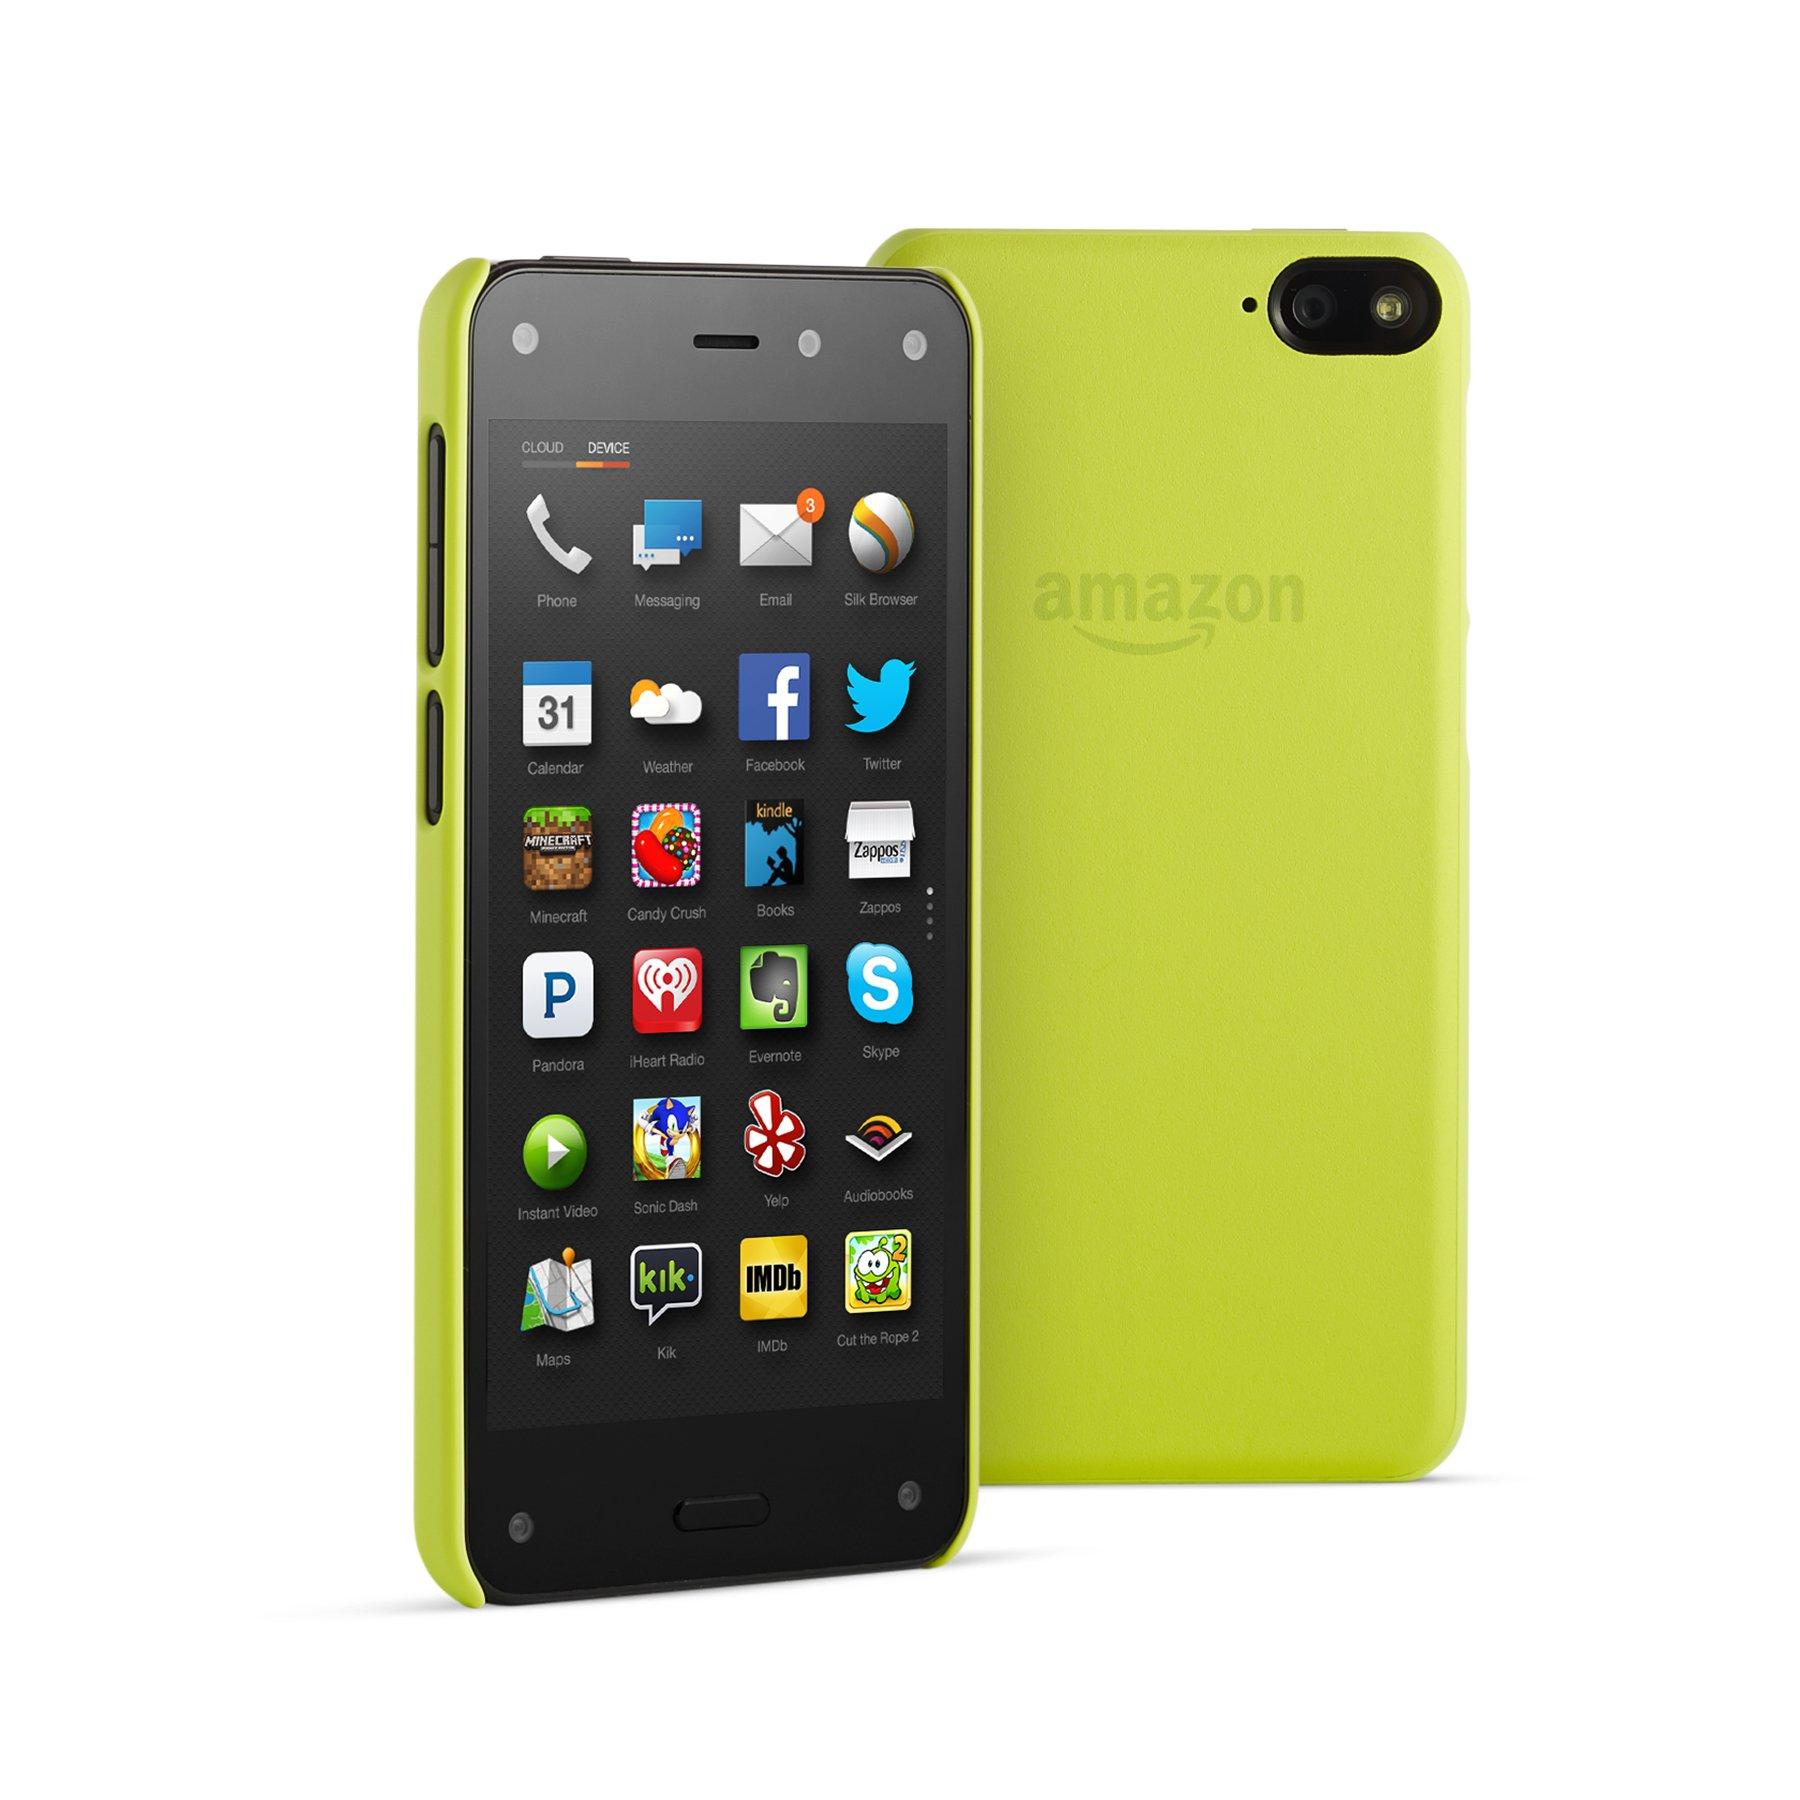 Amazon Polyurethane Case for Fire Phone, Citron